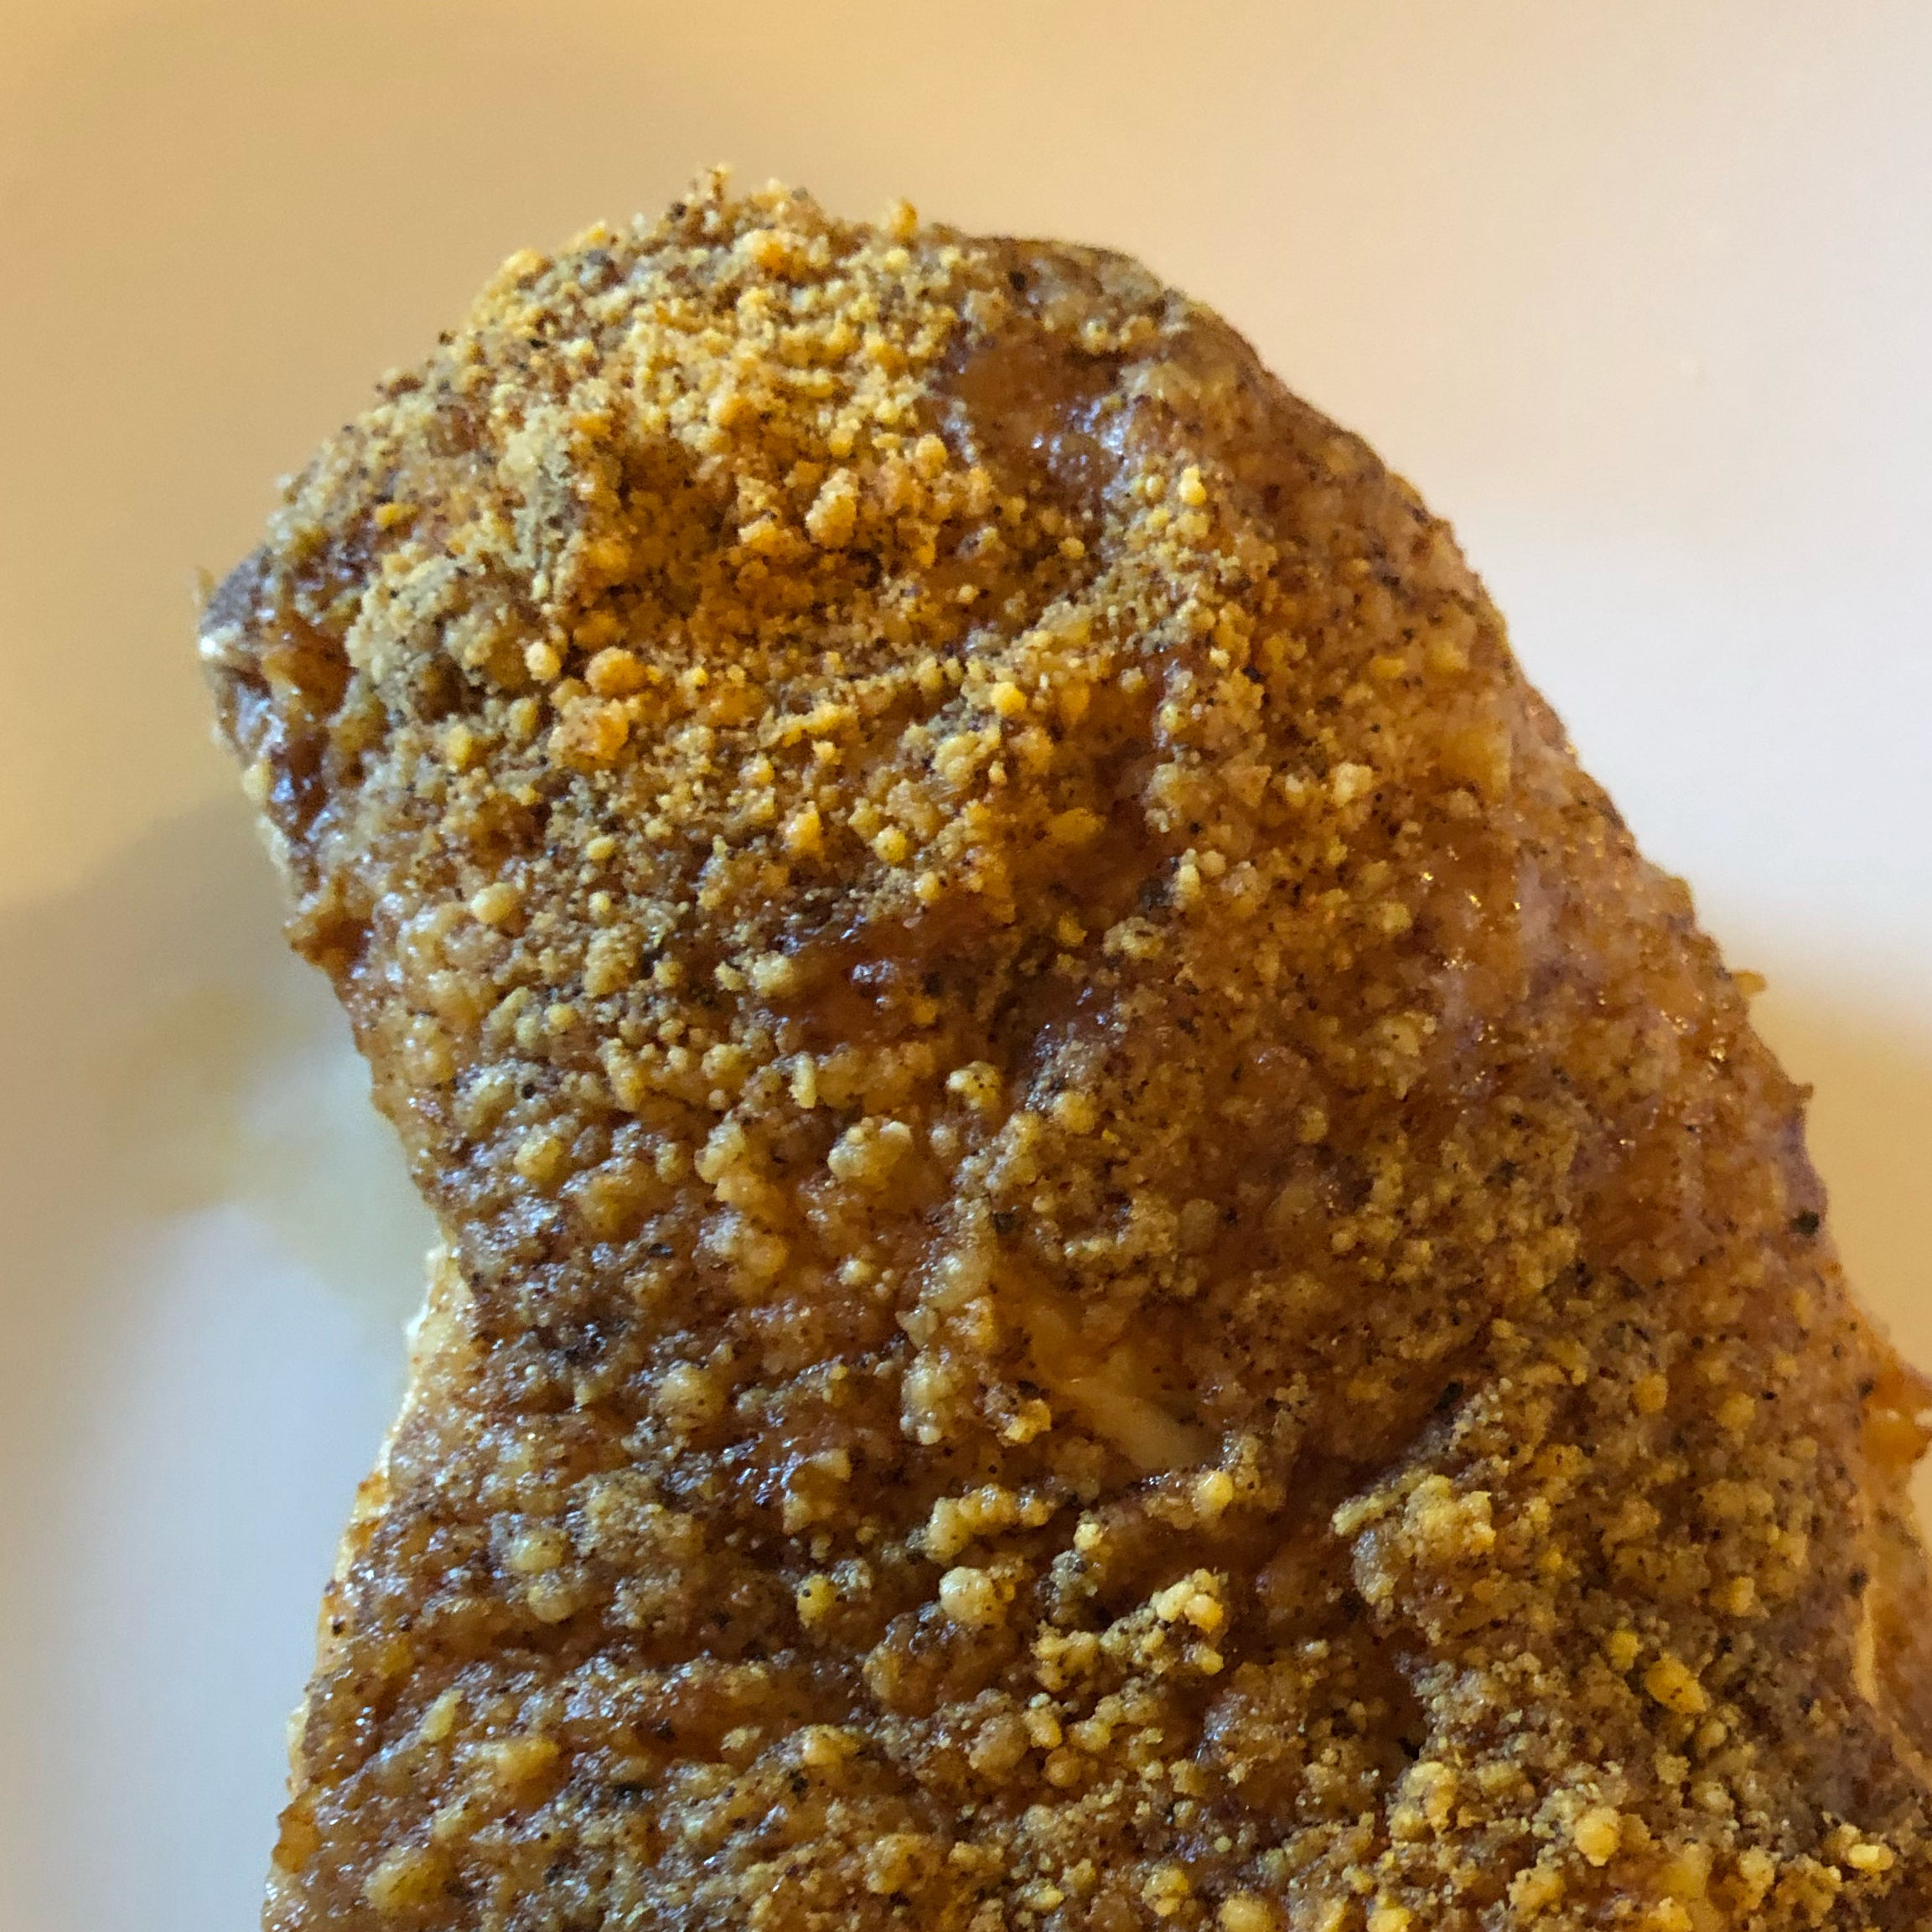 Baked Paprika-Parmesan Chicken PreciousVeal